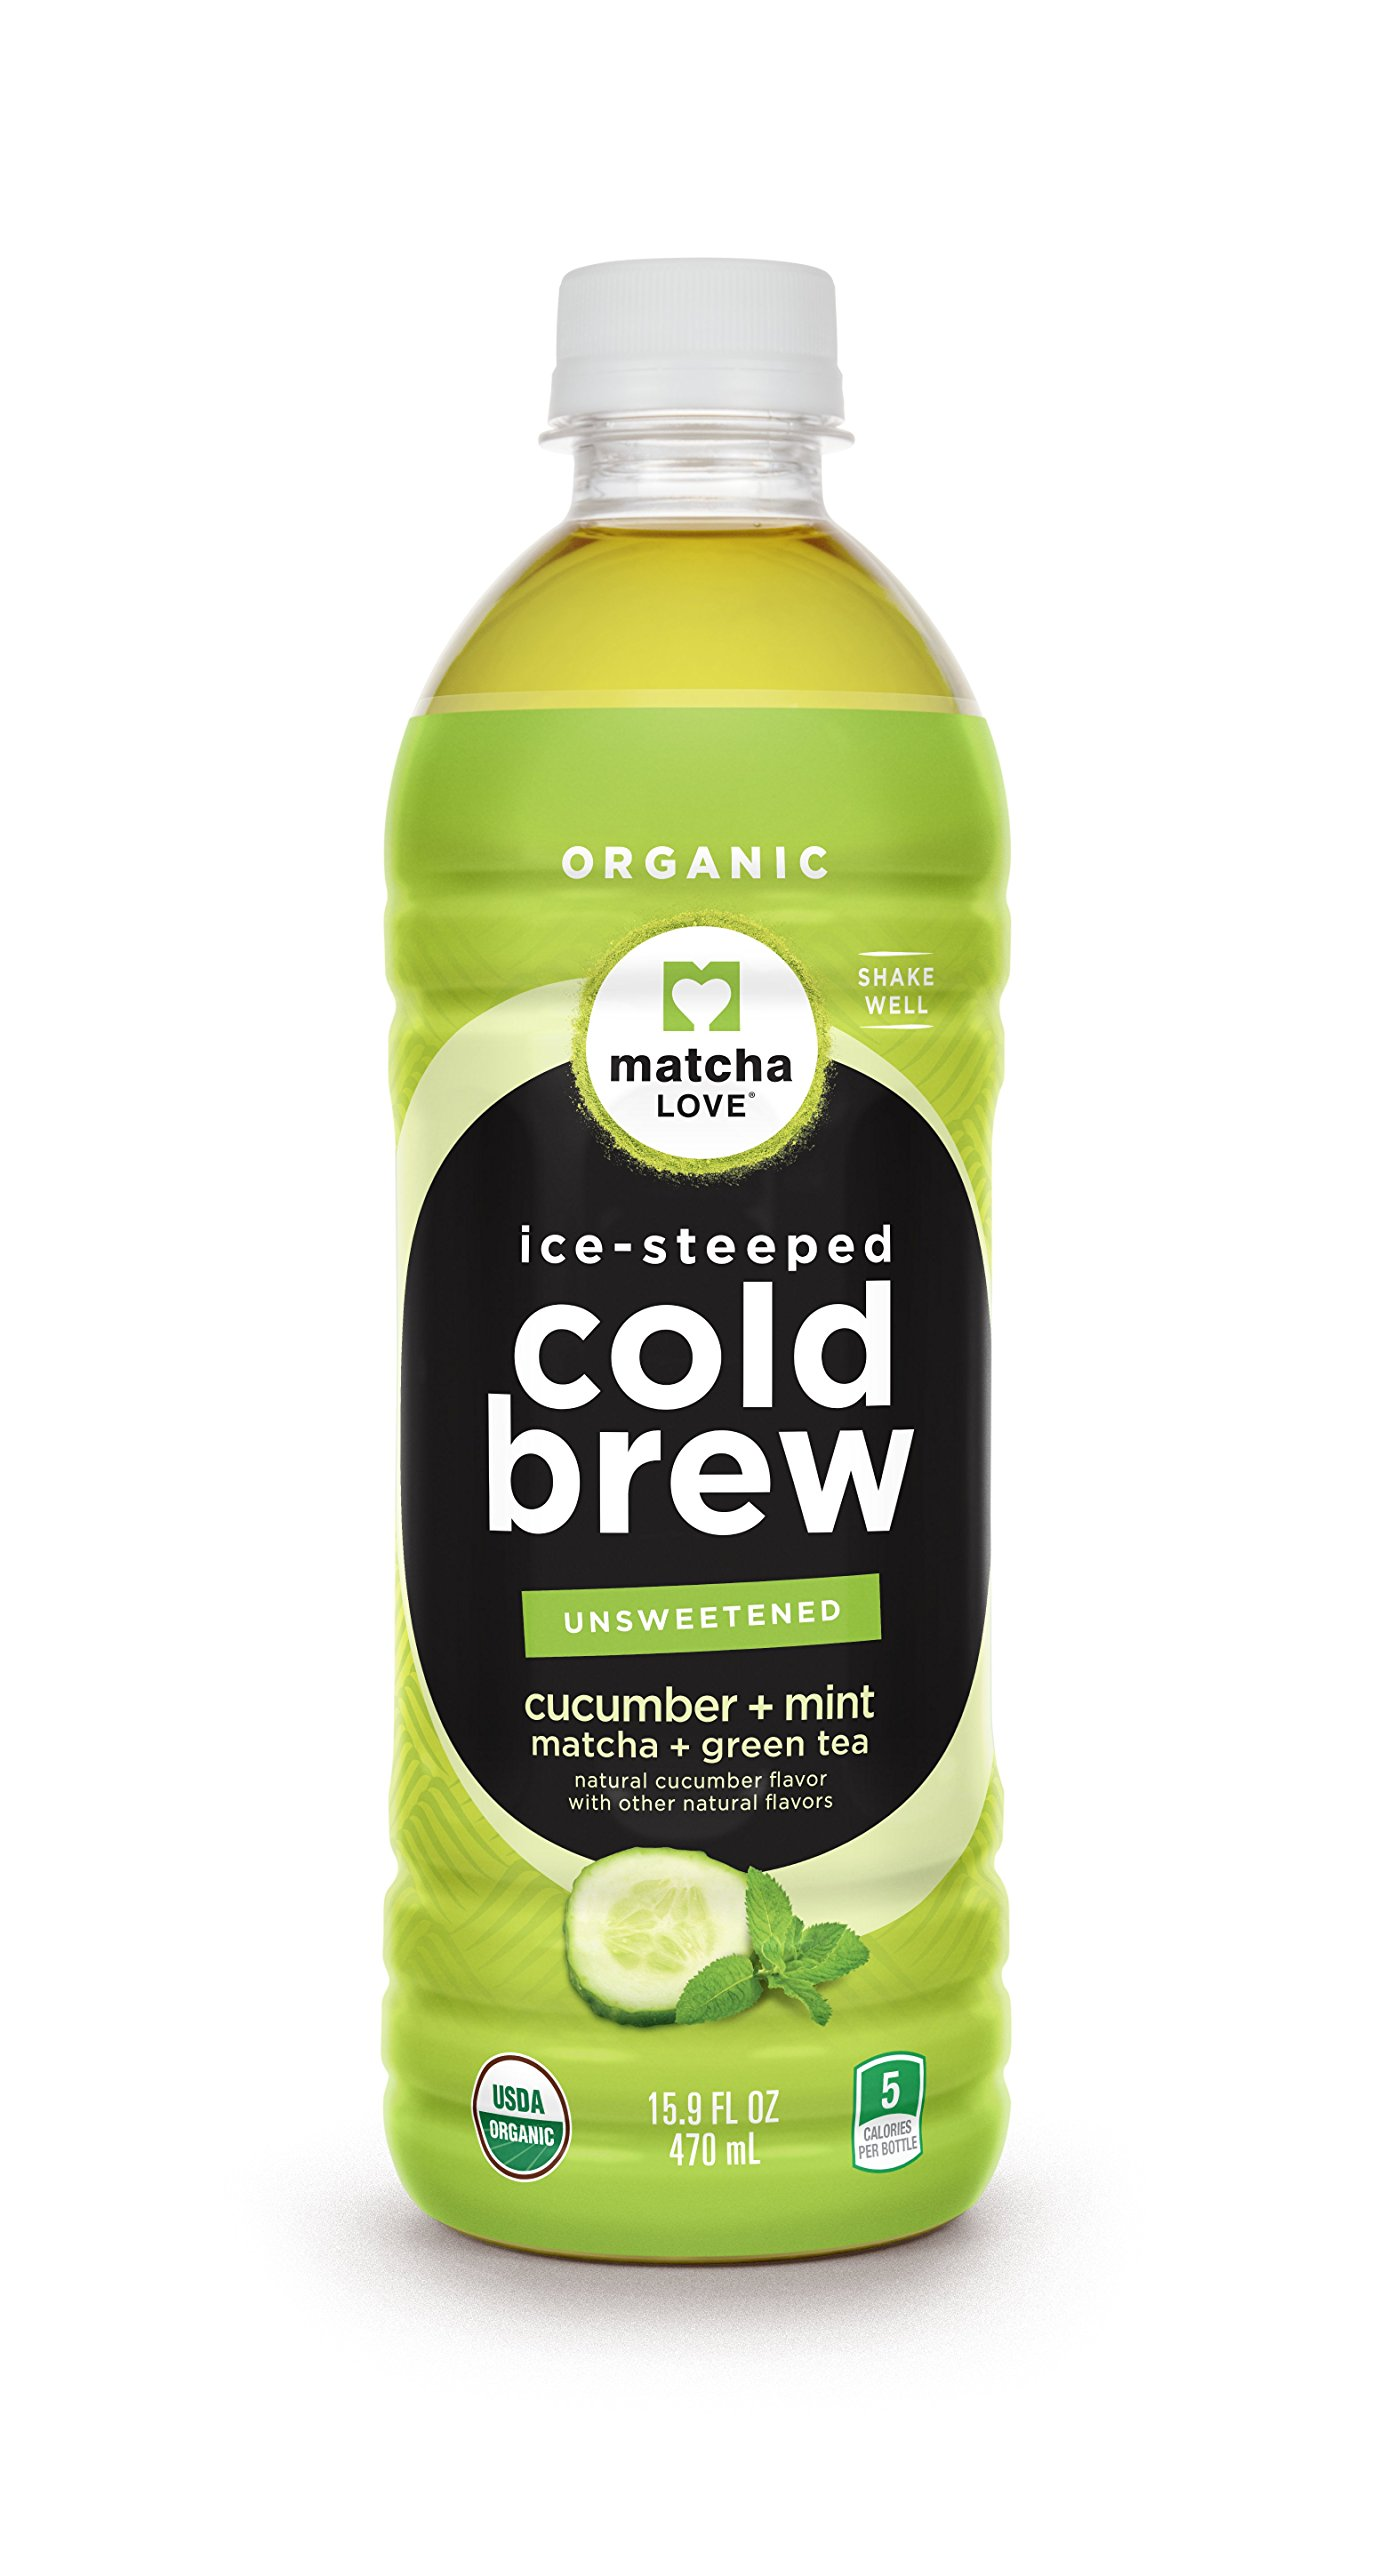 Matcha Love Cold Brew Cucumber Mint Matcha Green Tea 15.9 Ounce bottle 12 Count Unsweetened Green Tea, No Artificial Sweeteners USDA Certified Organic Caffeinated